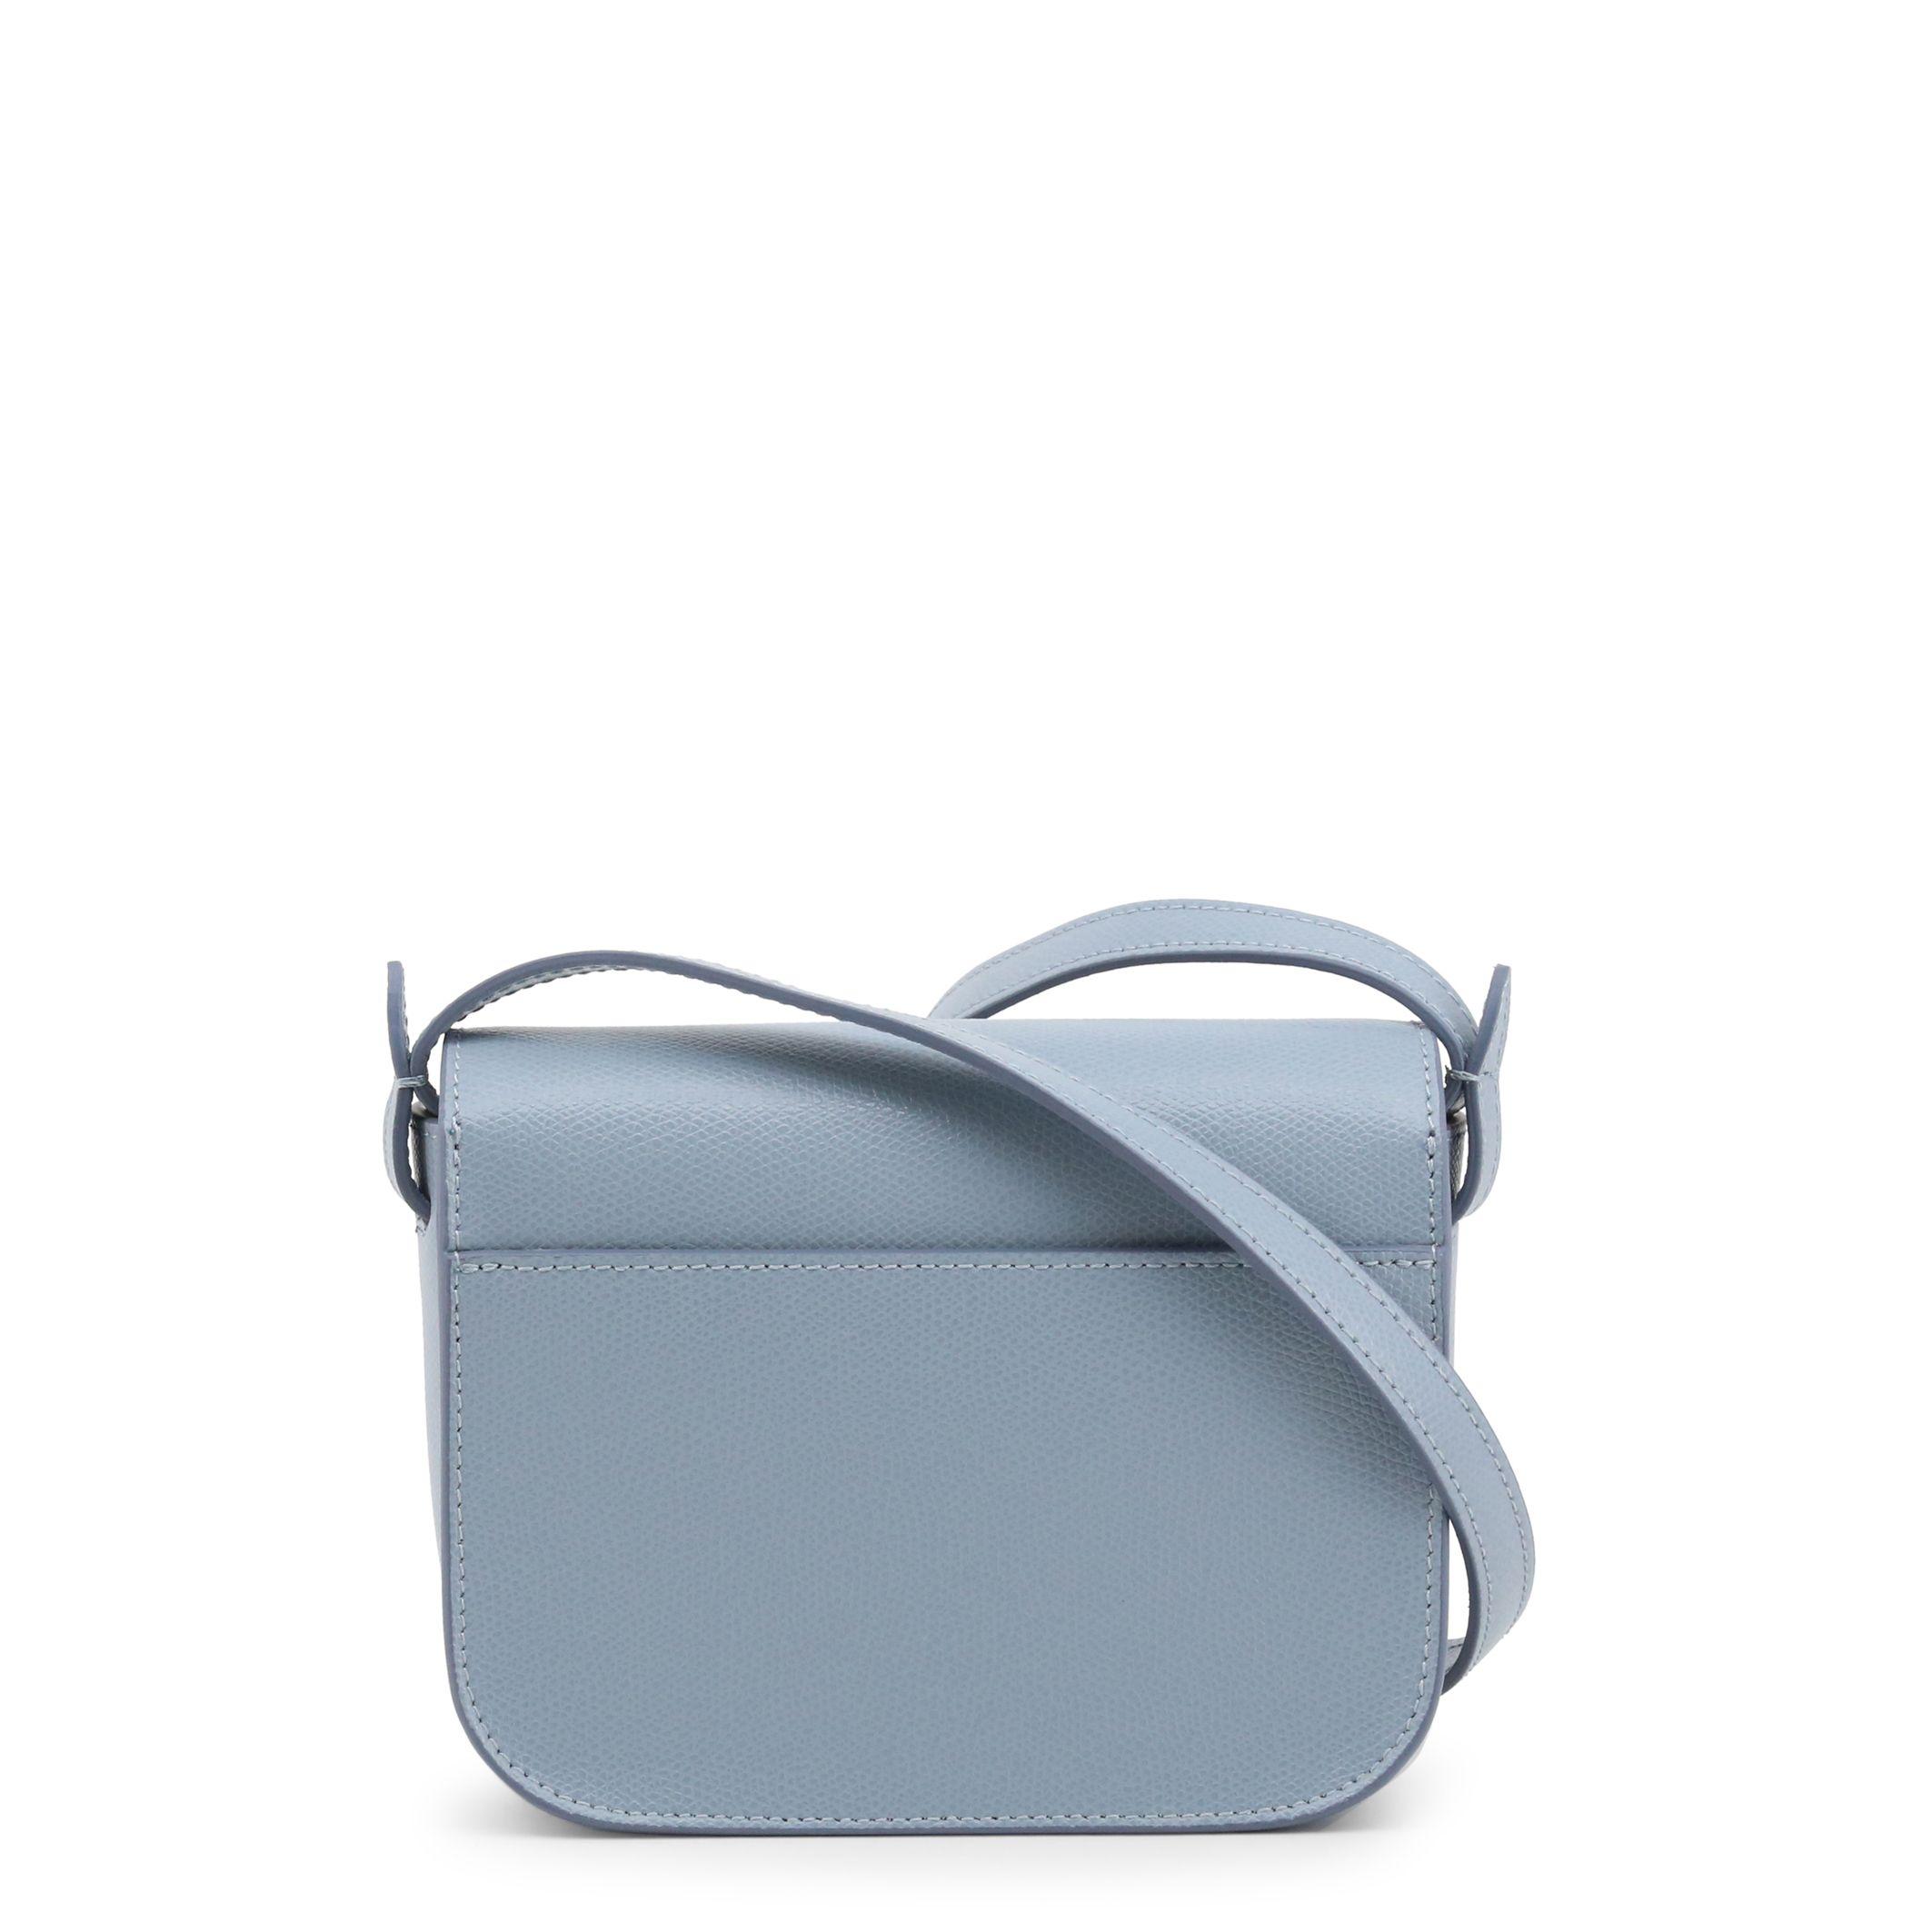 Furla - furla-1927_frangia - blau 3